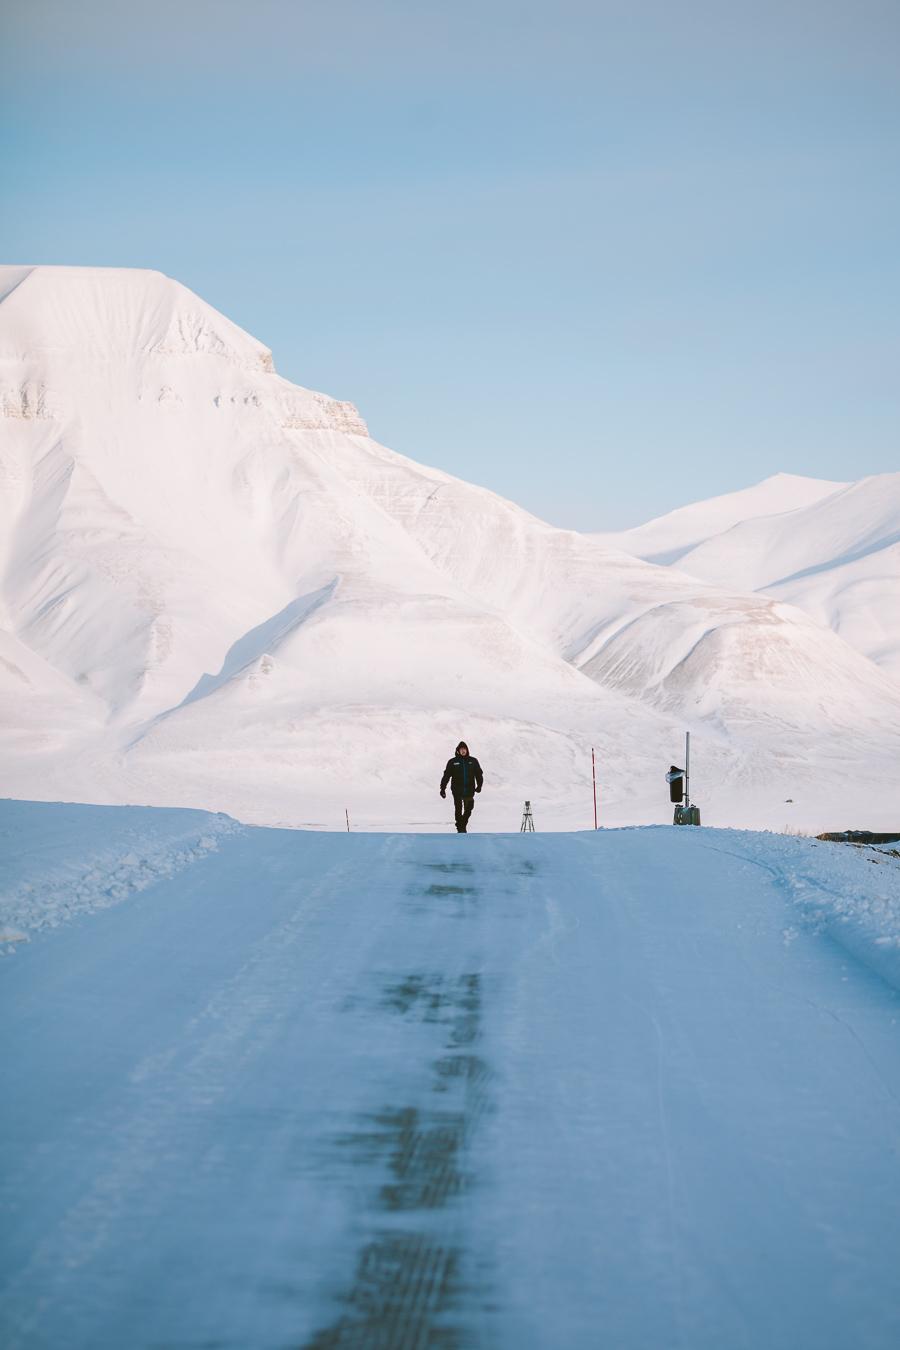 Man walking on icy snow